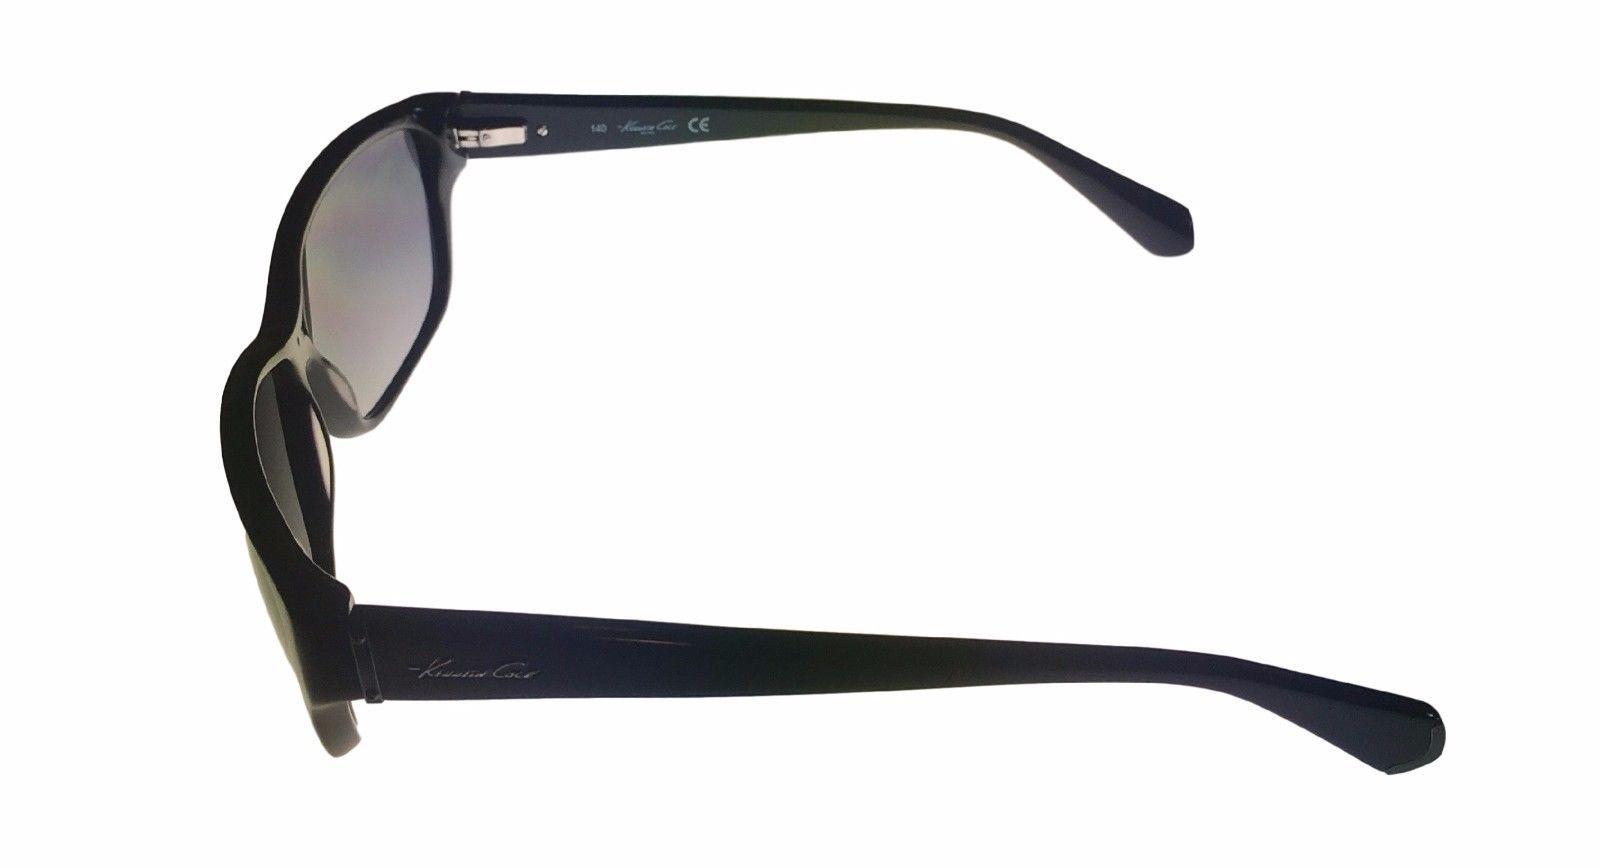 Kenneth Cole New York Mens Sunglass Soft Square Black, Smoke Lens KC7034 1B image 3